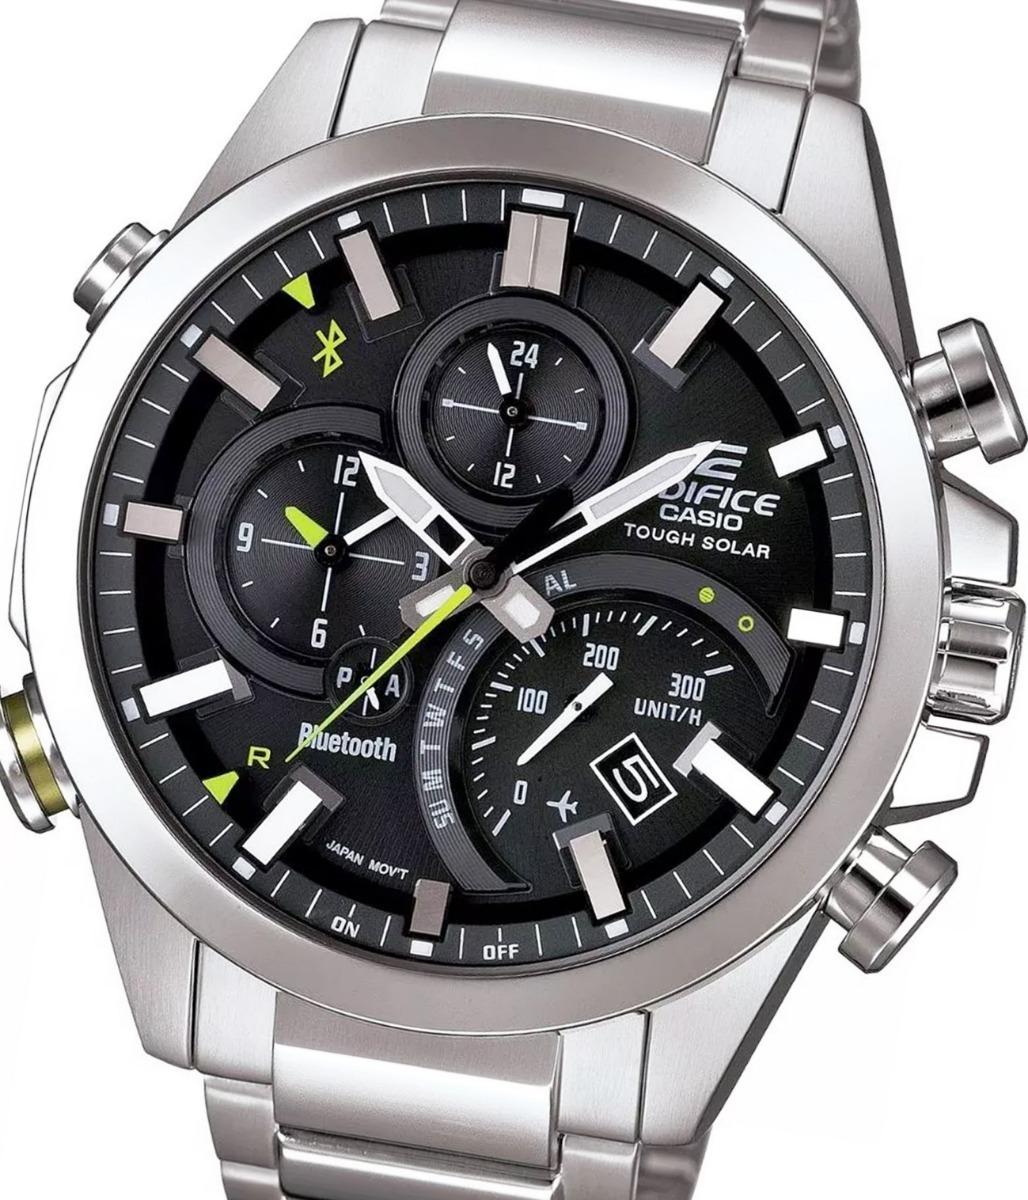 66503d30878e reloj hombre casio edifice cod eqb-500d-1a solar + bluetooth. Cargando zoom.